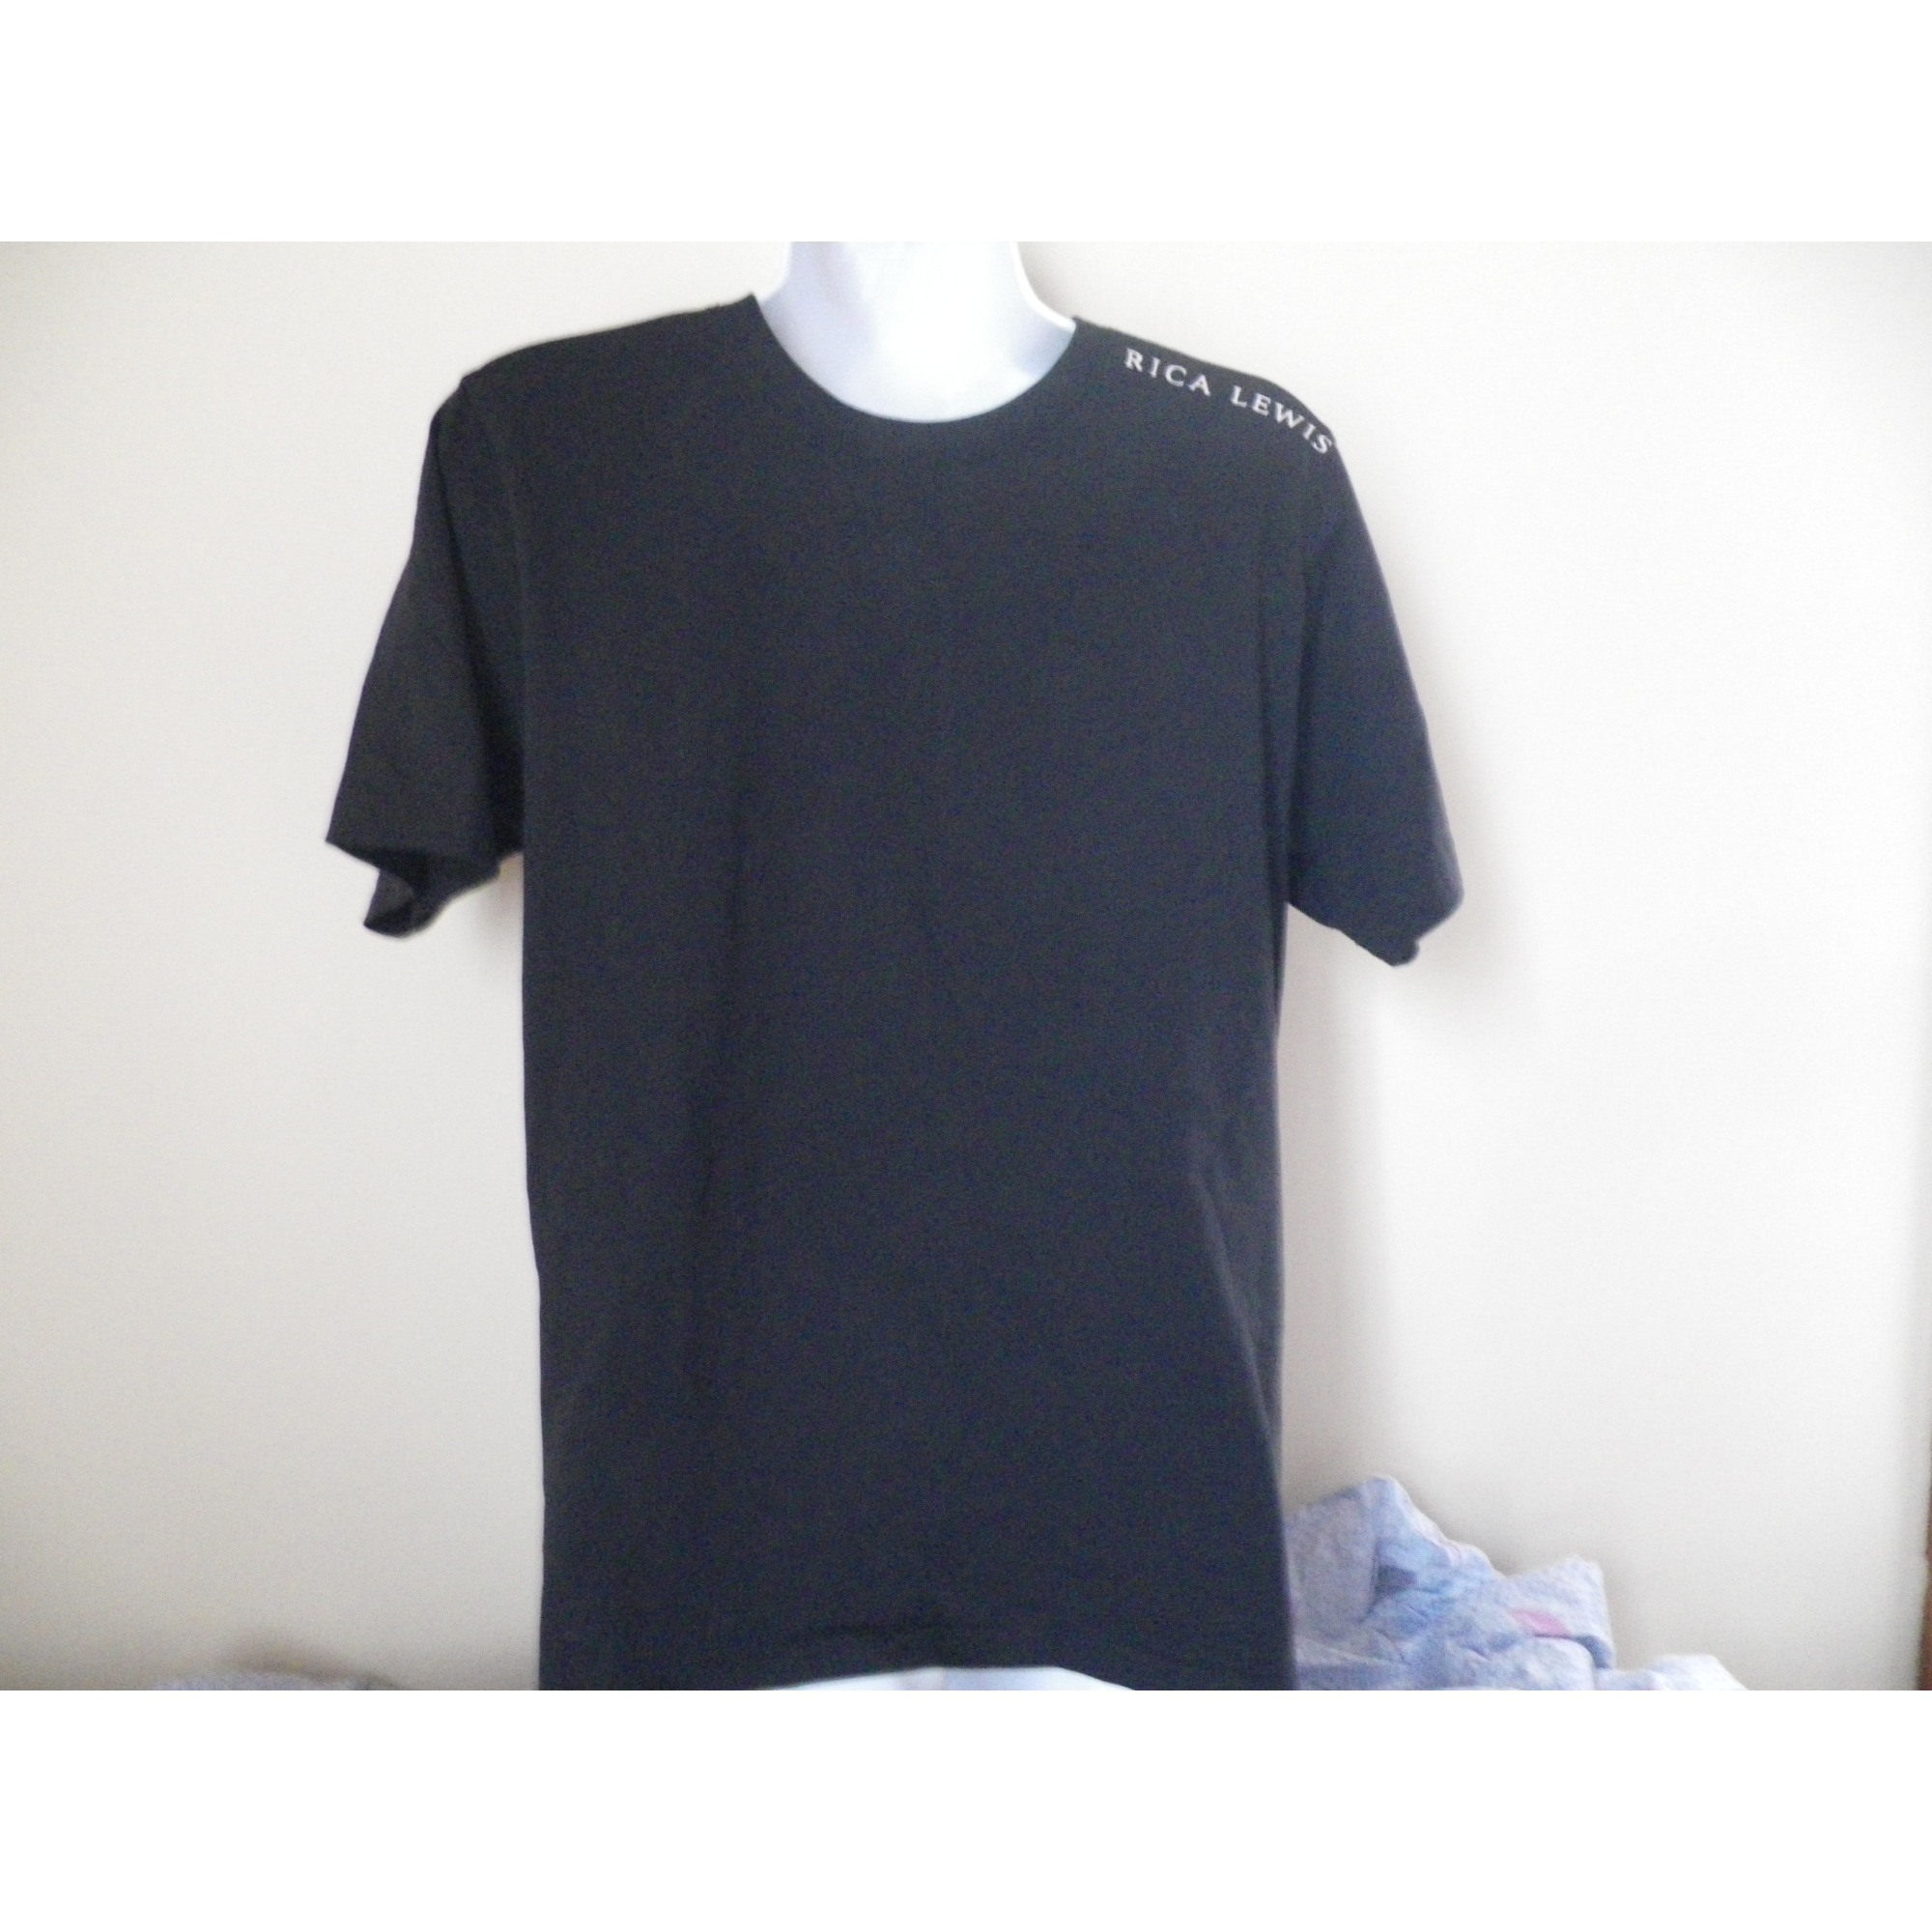 Tee-shirt RICA LEWIS Noir